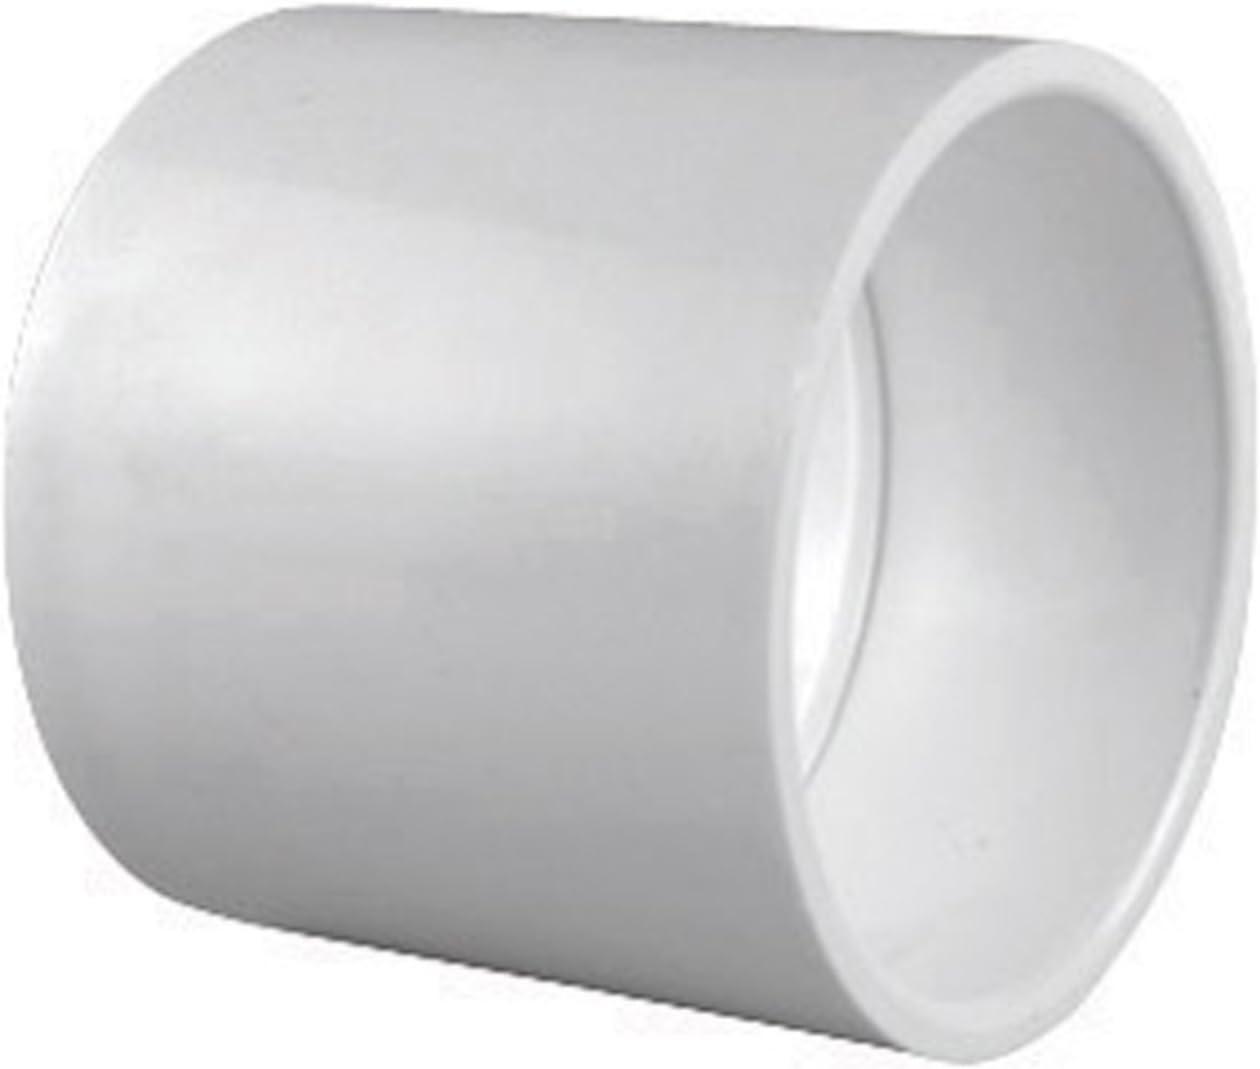 Schedule 40 PVC Pipe Slip x Slip Coupling (1 1/4